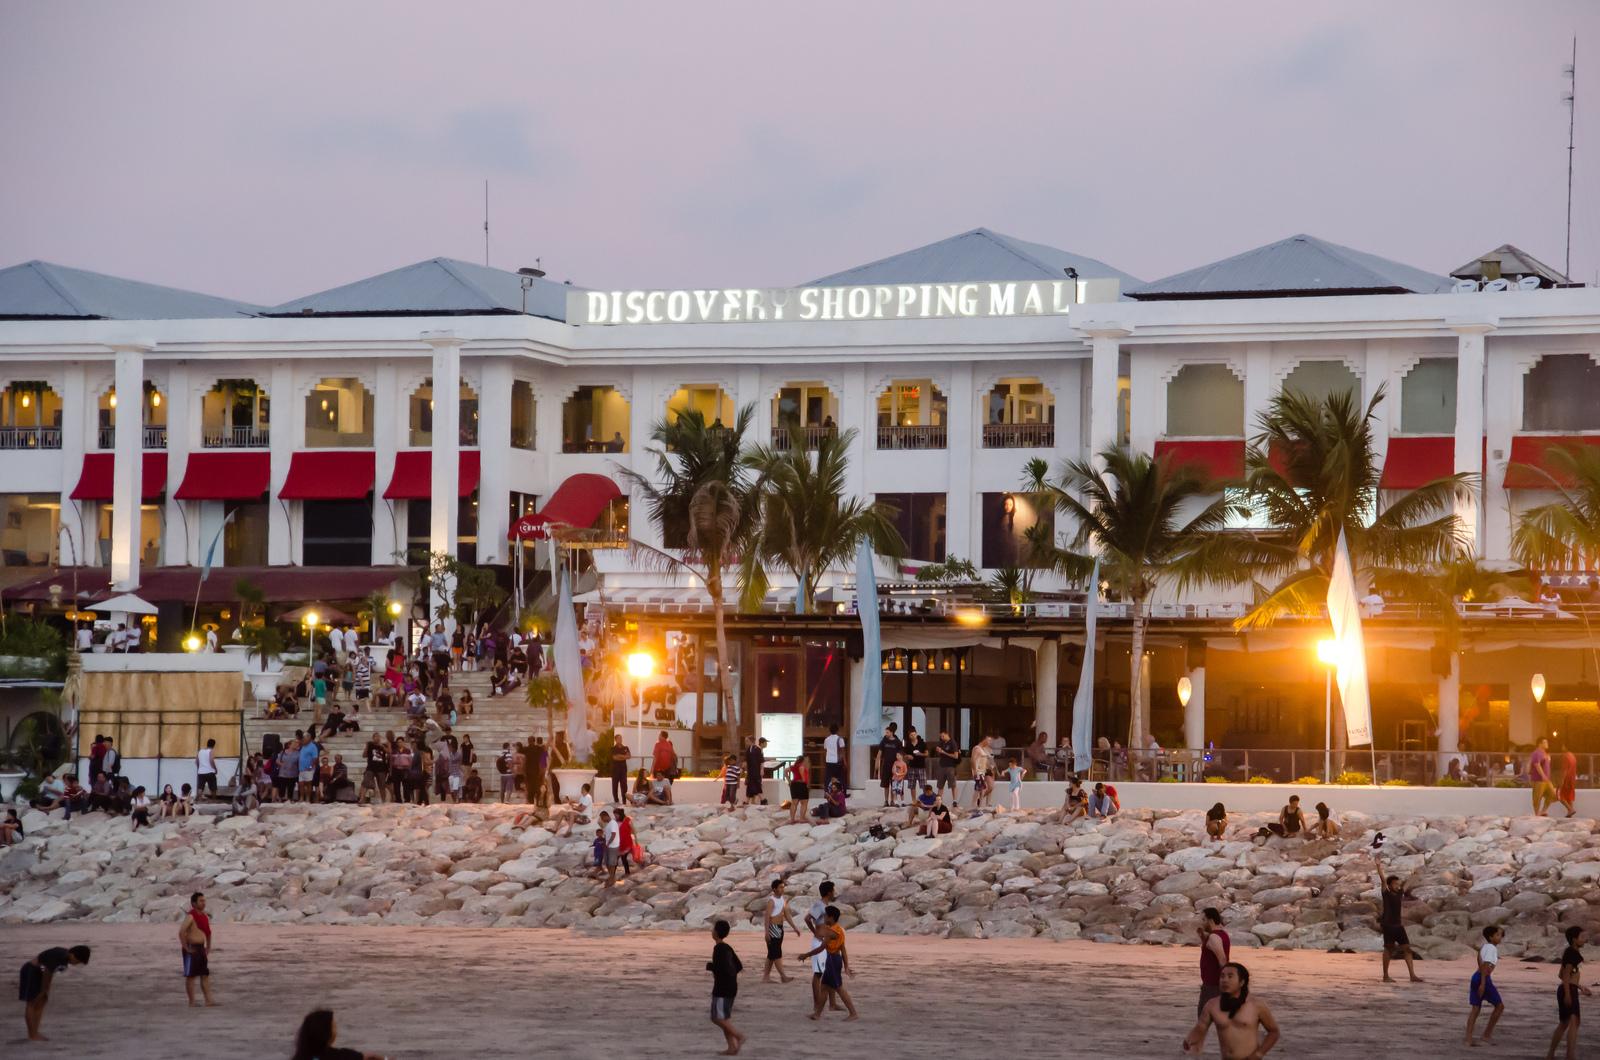 Article Mojonesia Beachwalk Kab Badung